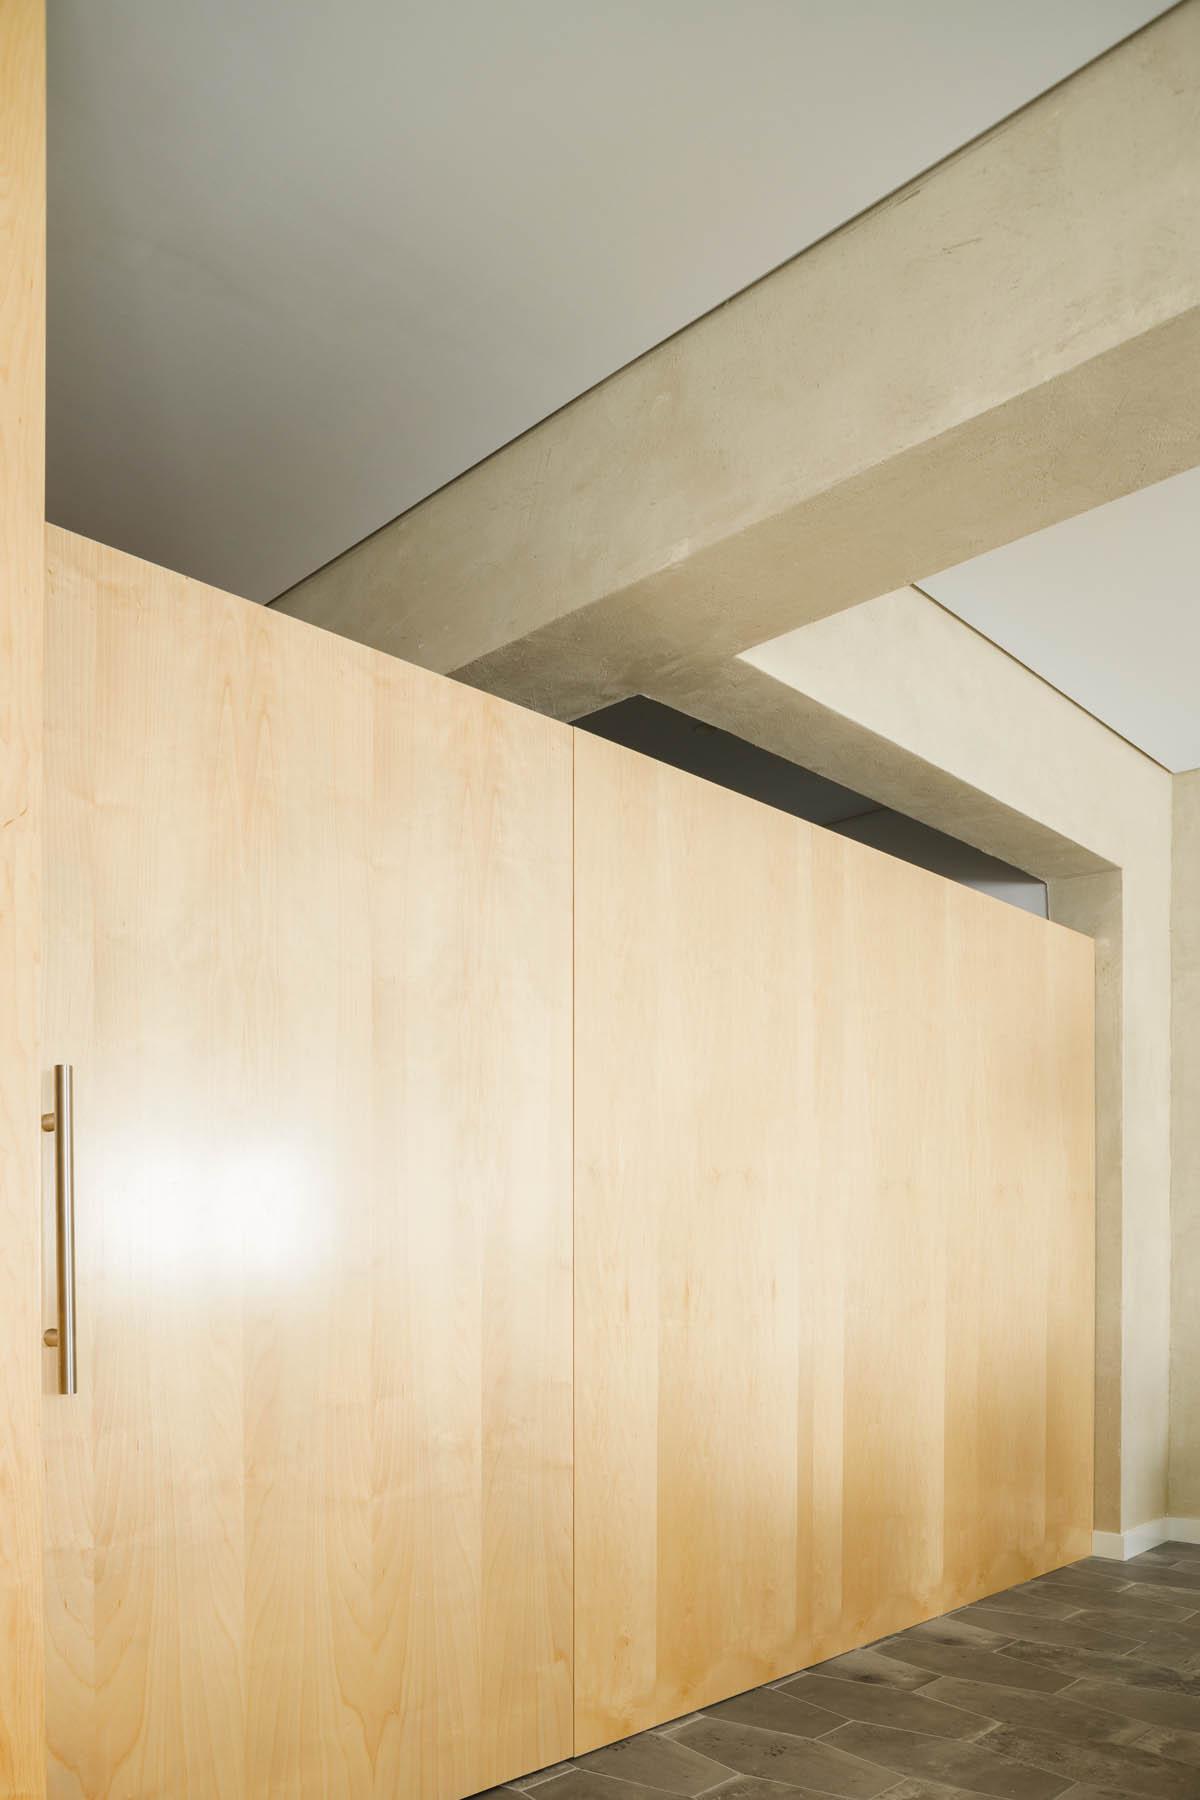 Apartamento Familiar no Porto do Atelier Paulo Moreira Architect